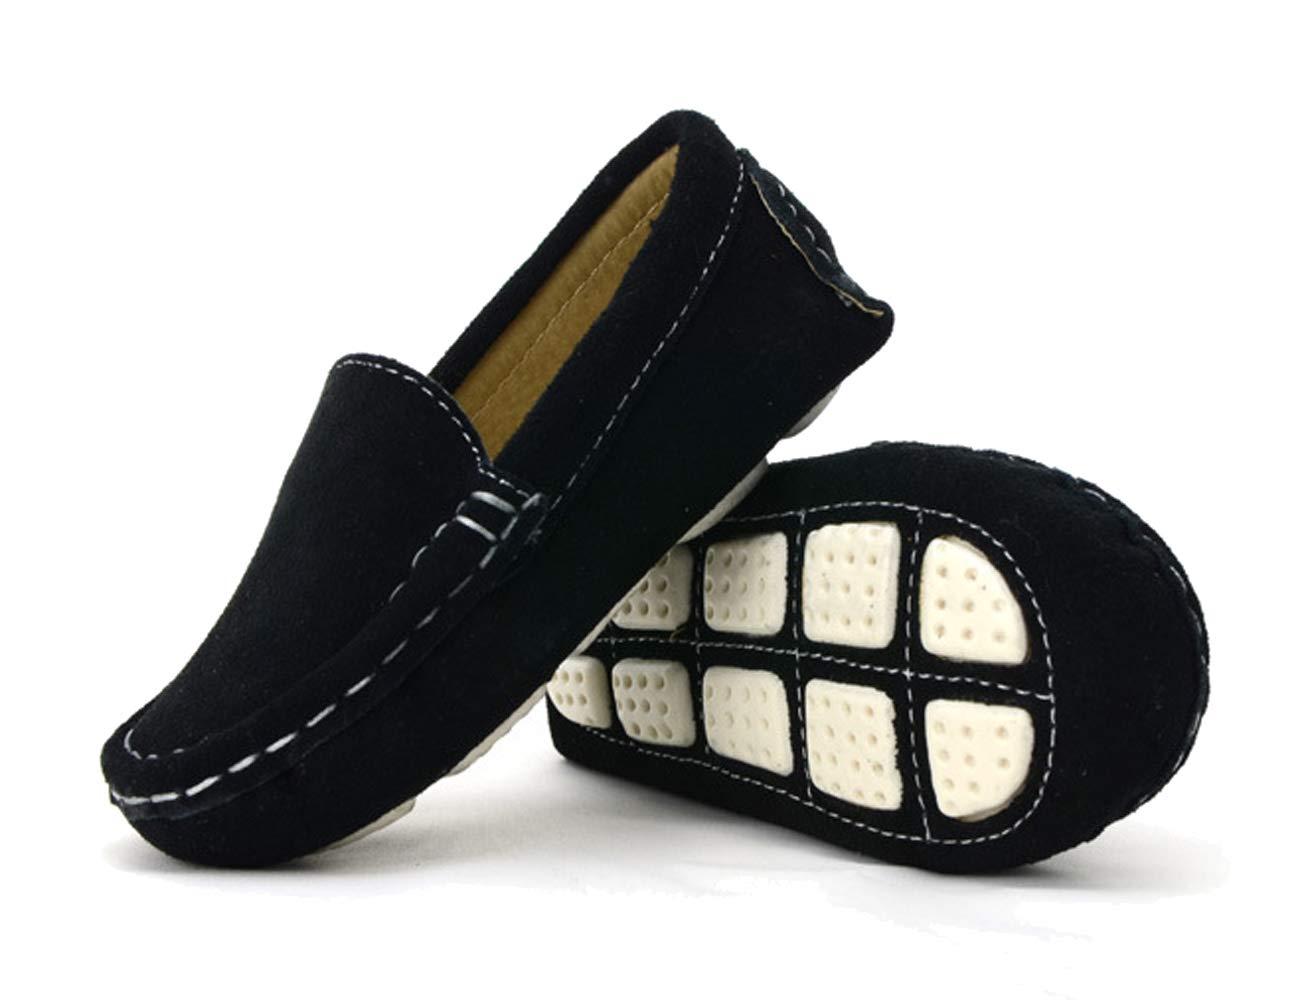 WUIWUIYU Boys' Girls' Suede Slip-On Loafers Flats Moccasins Comfort Casual Shoes Black Size 7 M by WUIWUIYU (Image #4)